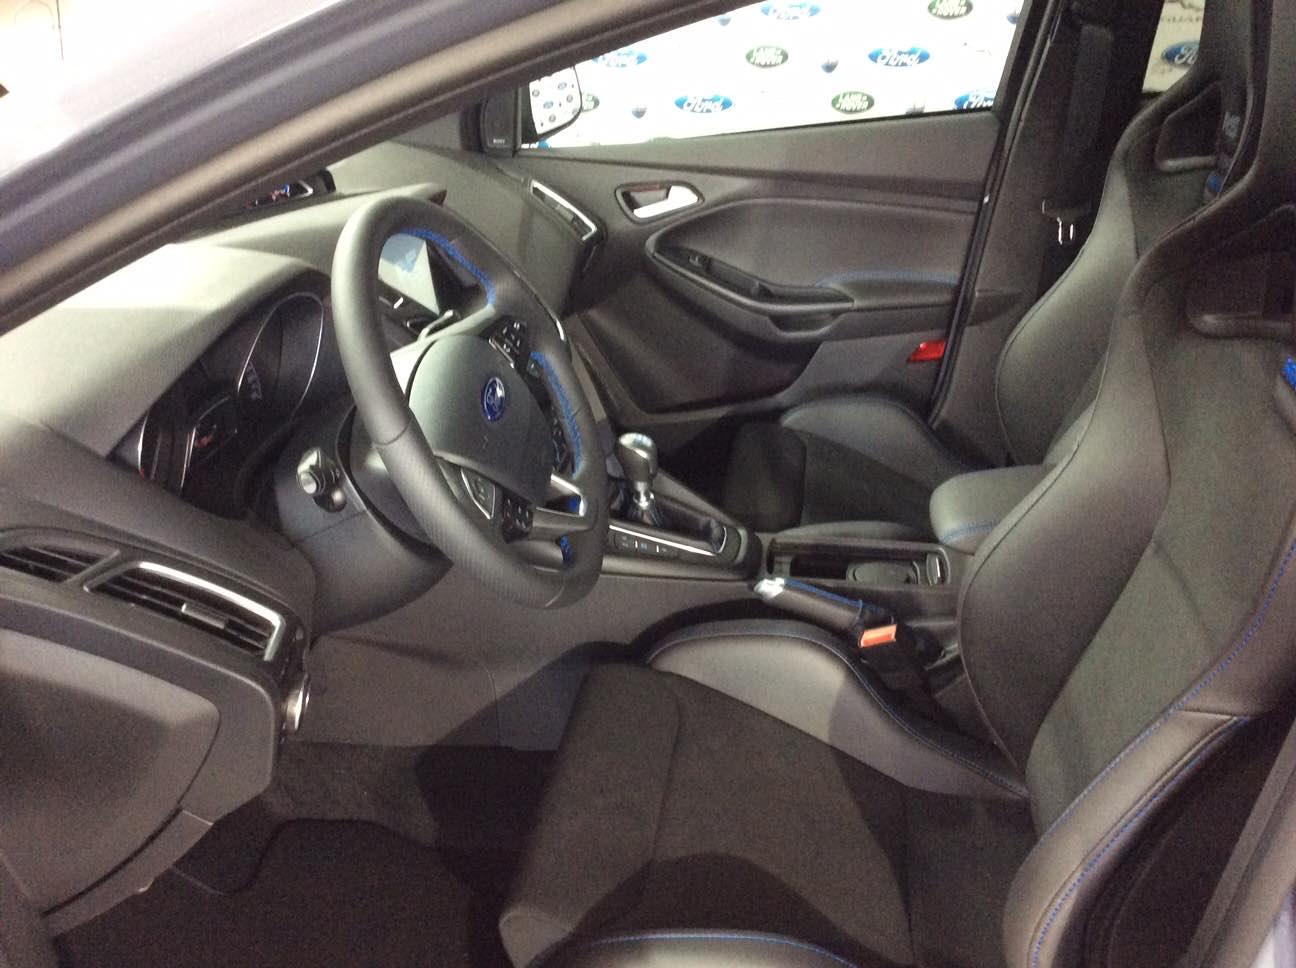 Ford Focus RS 2017 Grau 1